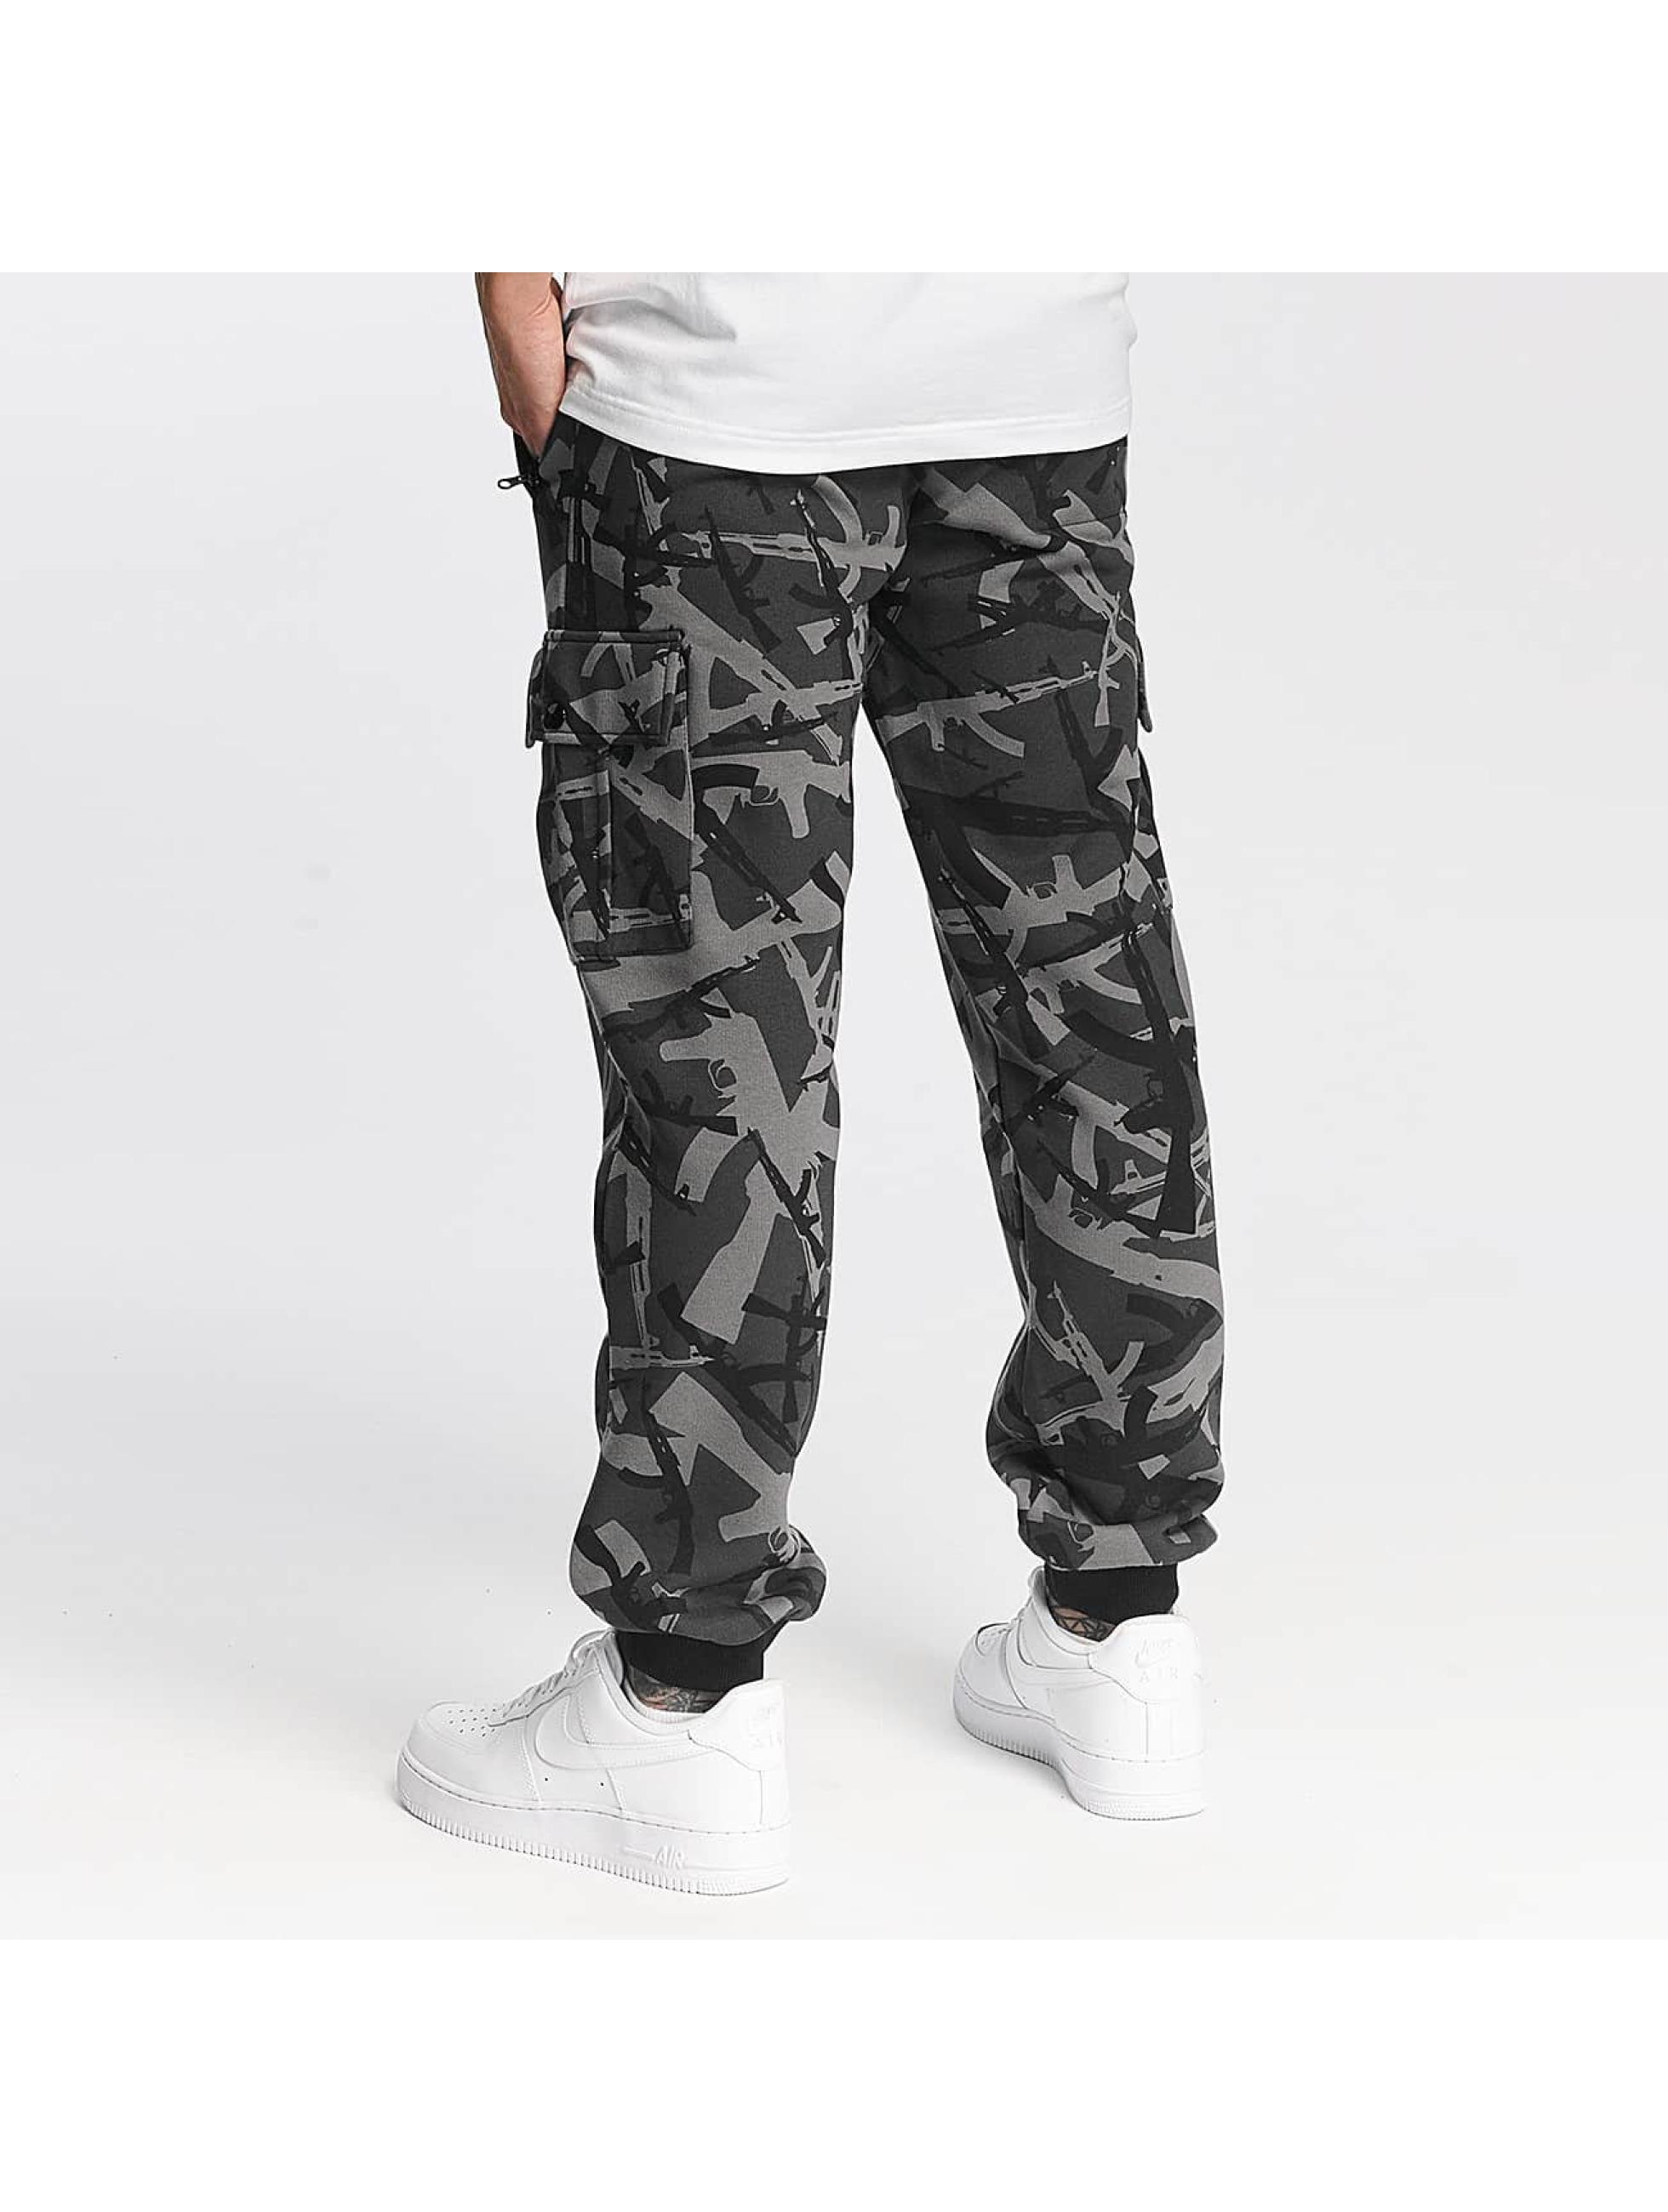 Pusher Apparel Pantalón deportivo AK Camo camuflaje